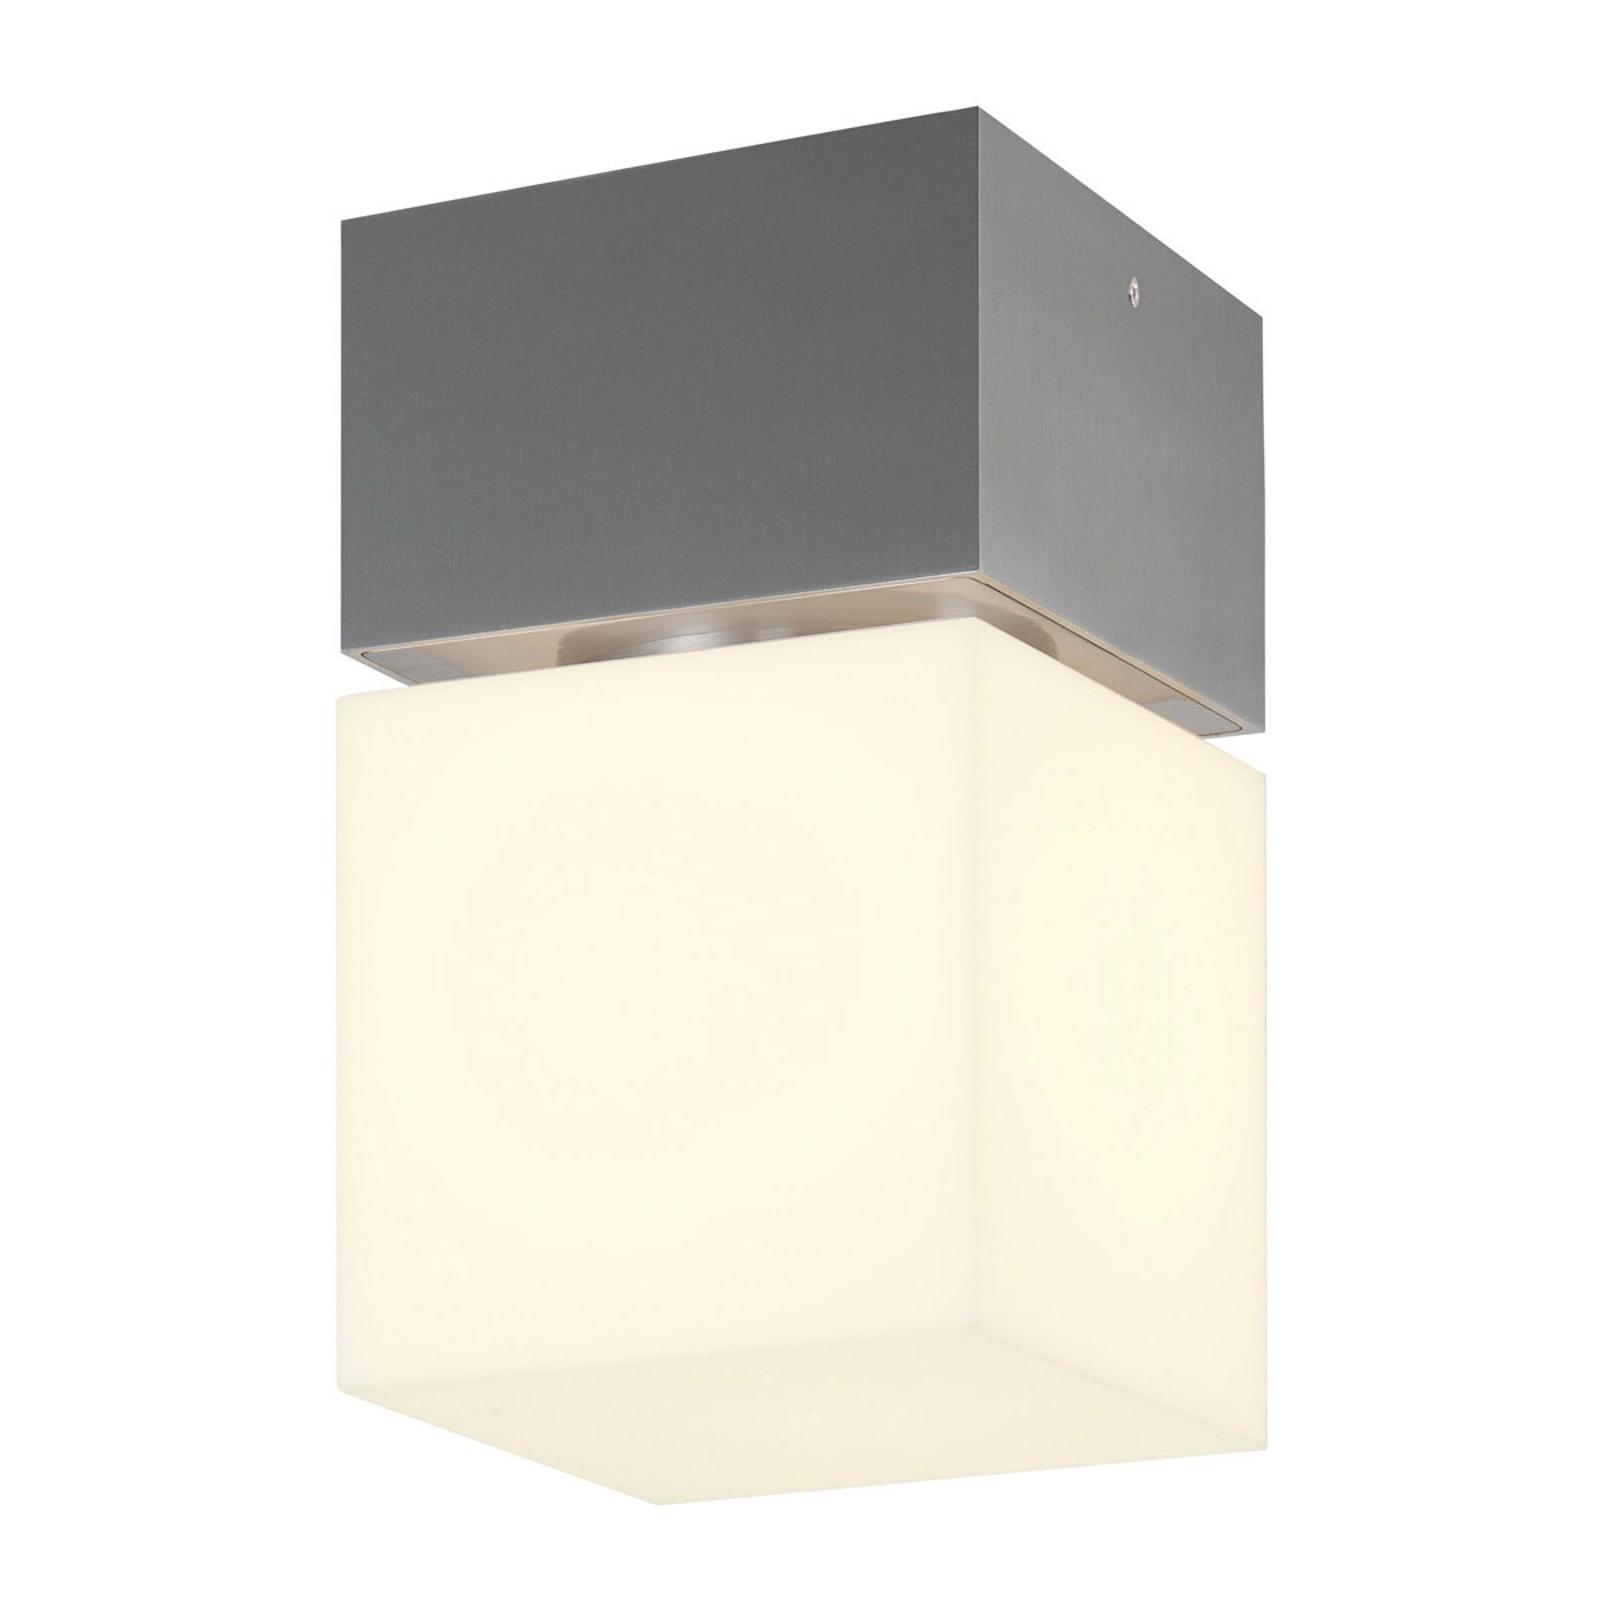 SLV Square lampa sufitowa zewnętrzna LED